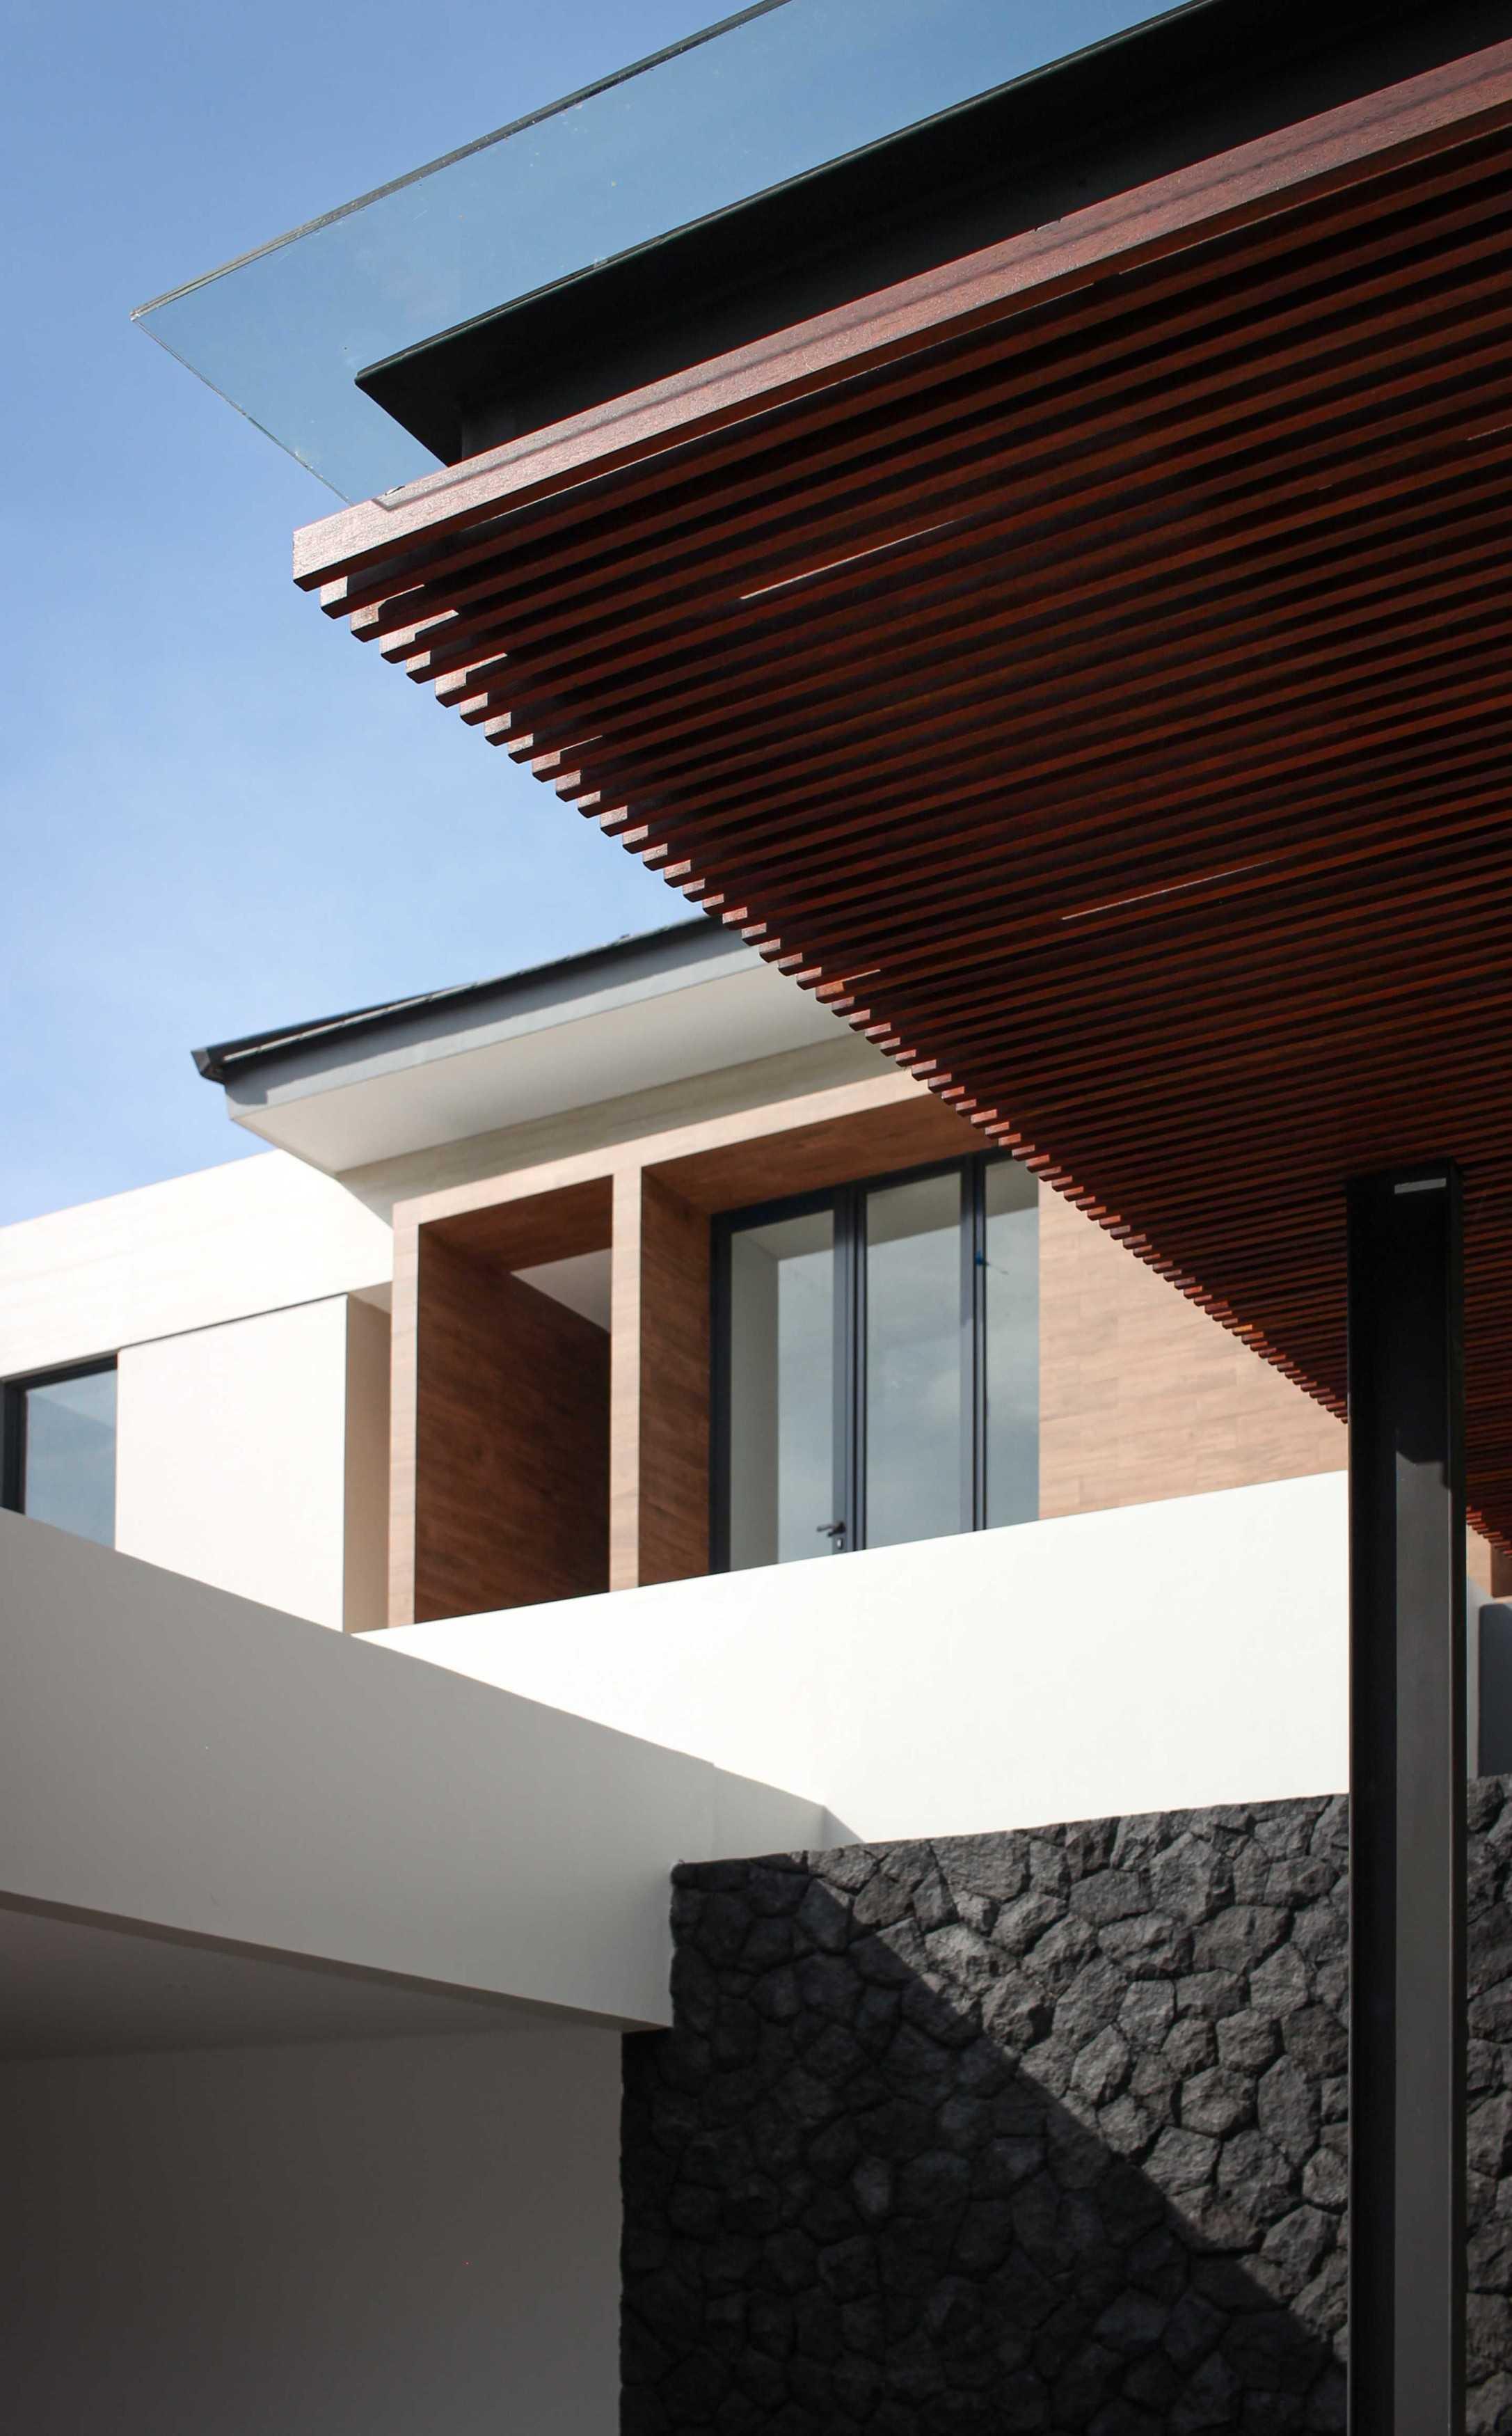 Y0 Design Architect S House Kec. Srono, Kabupaten Banyuwangi, Jawa Timur, Indonesia Kec. Srono, Kabupaten Banyuwangi, Jawa Timur, Indonesia Yohanes-Iswara-Limandjaya-S-House   121096